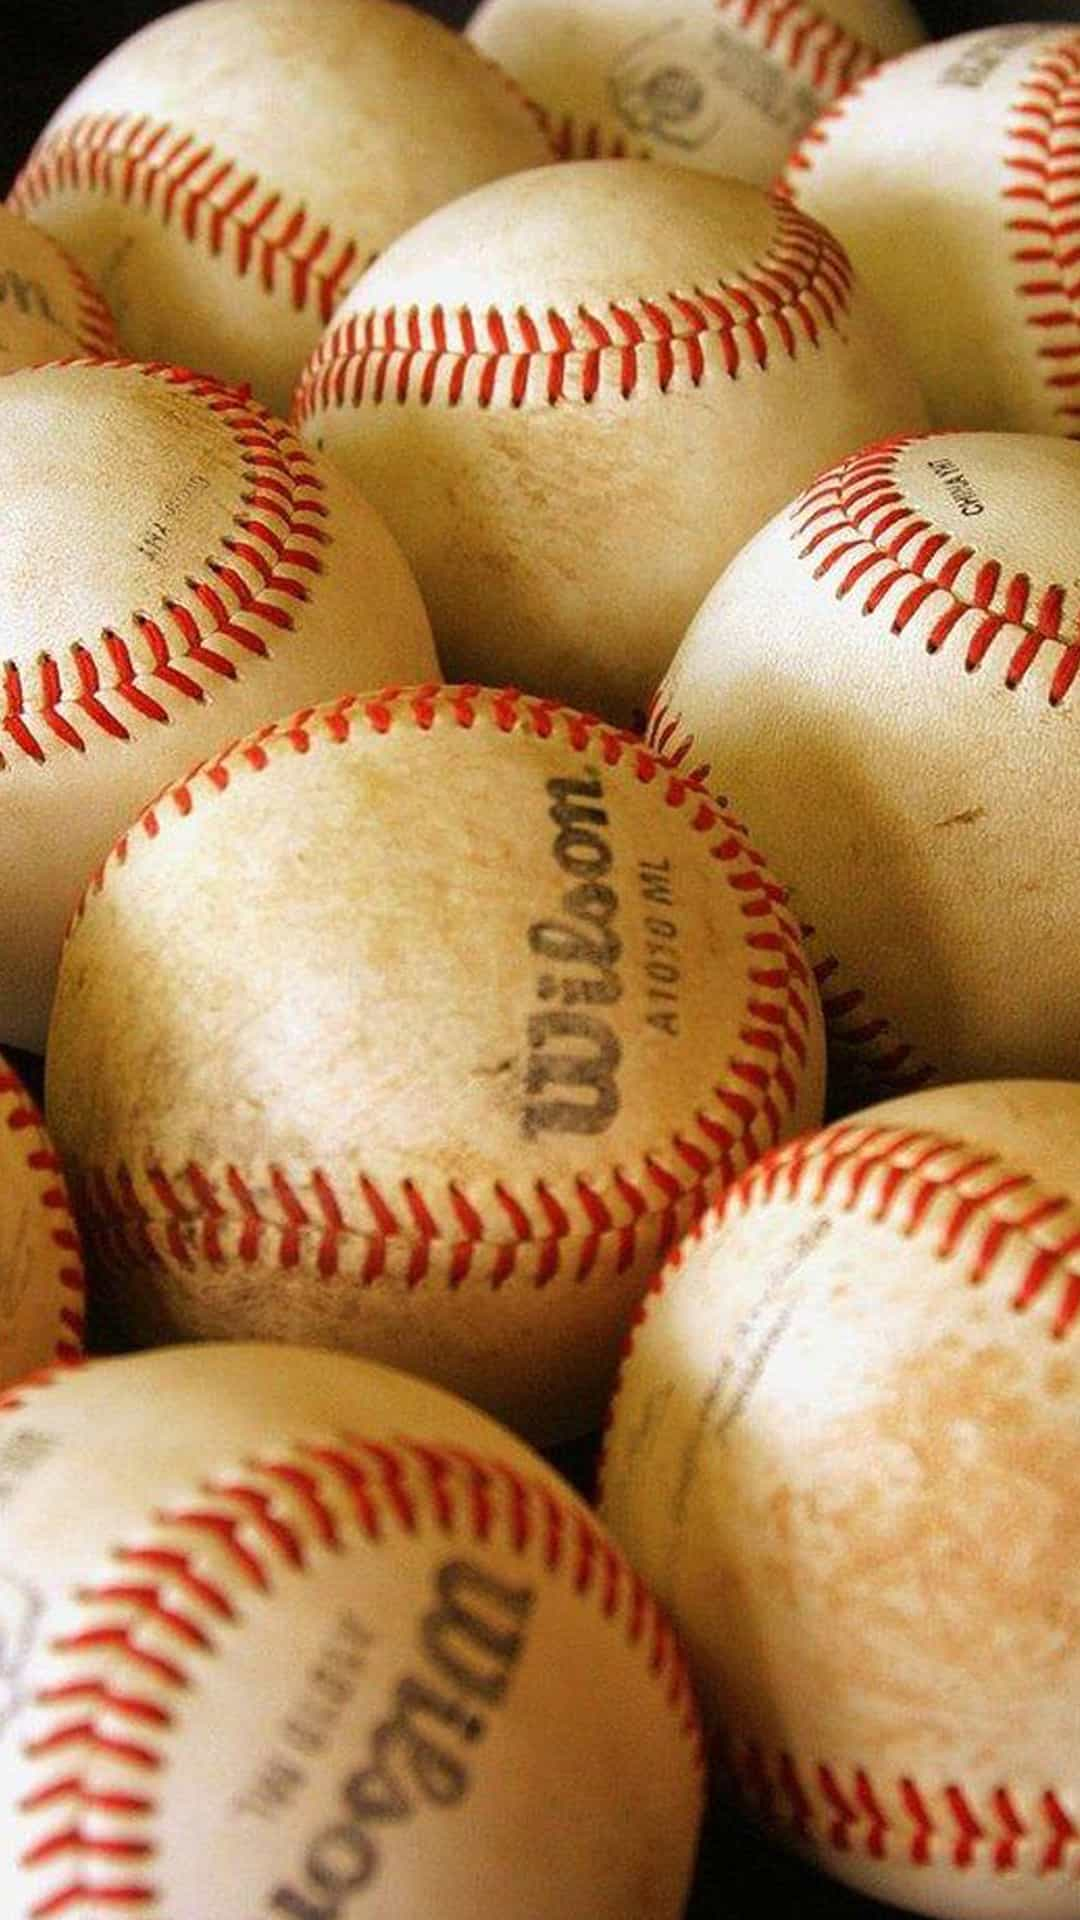 wilson-baseball-balls-android-wallpaper